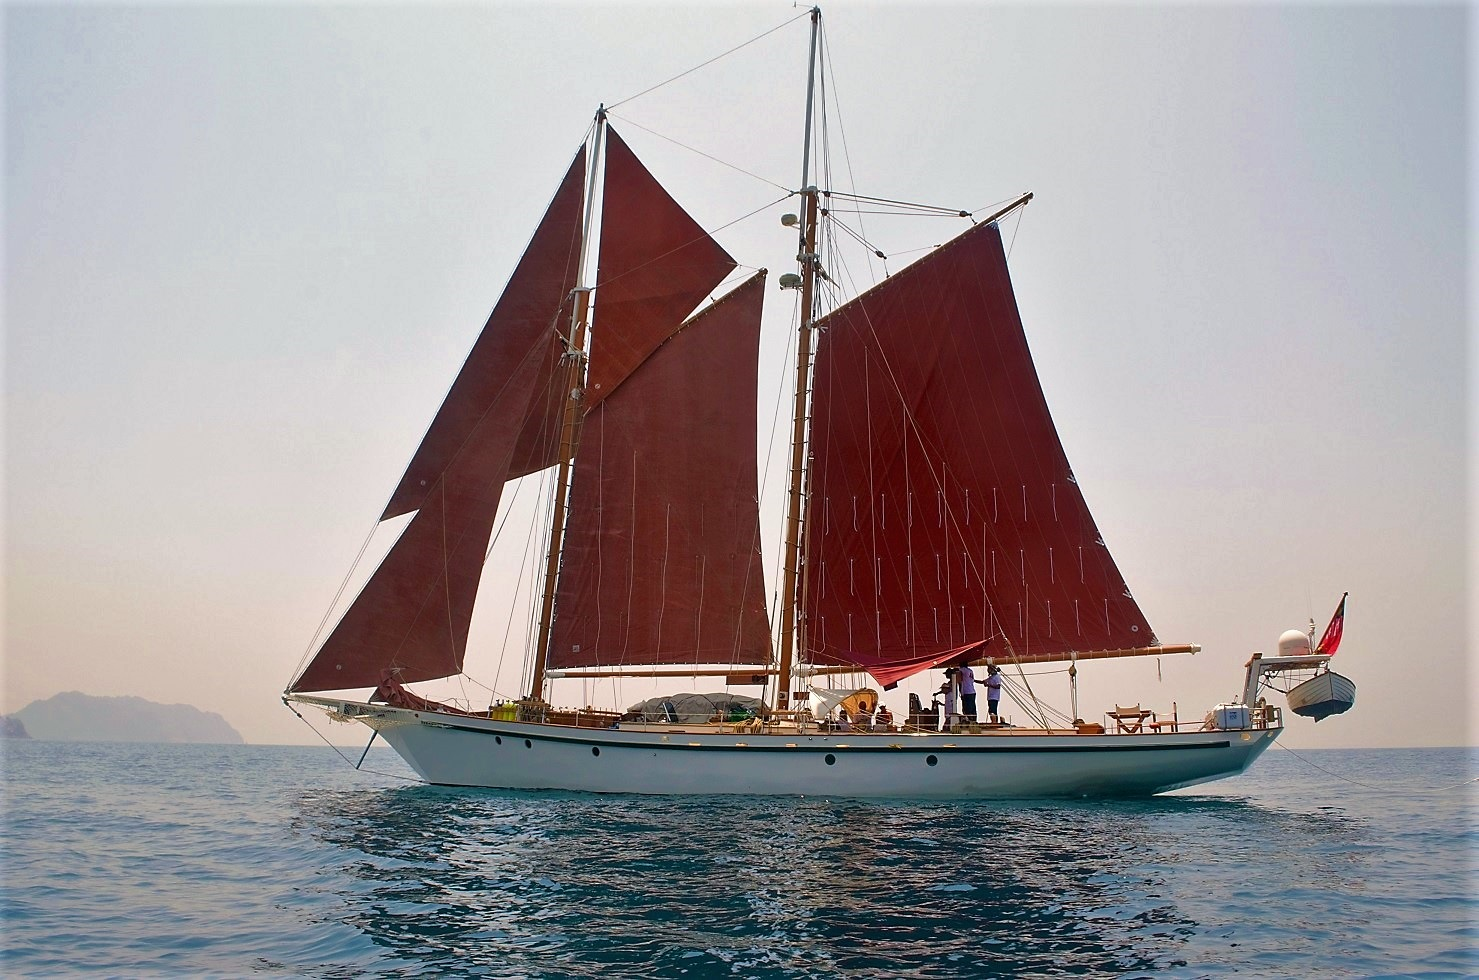 Dallinghoo_yacht under sail cruise trip in Moken 1.jpg